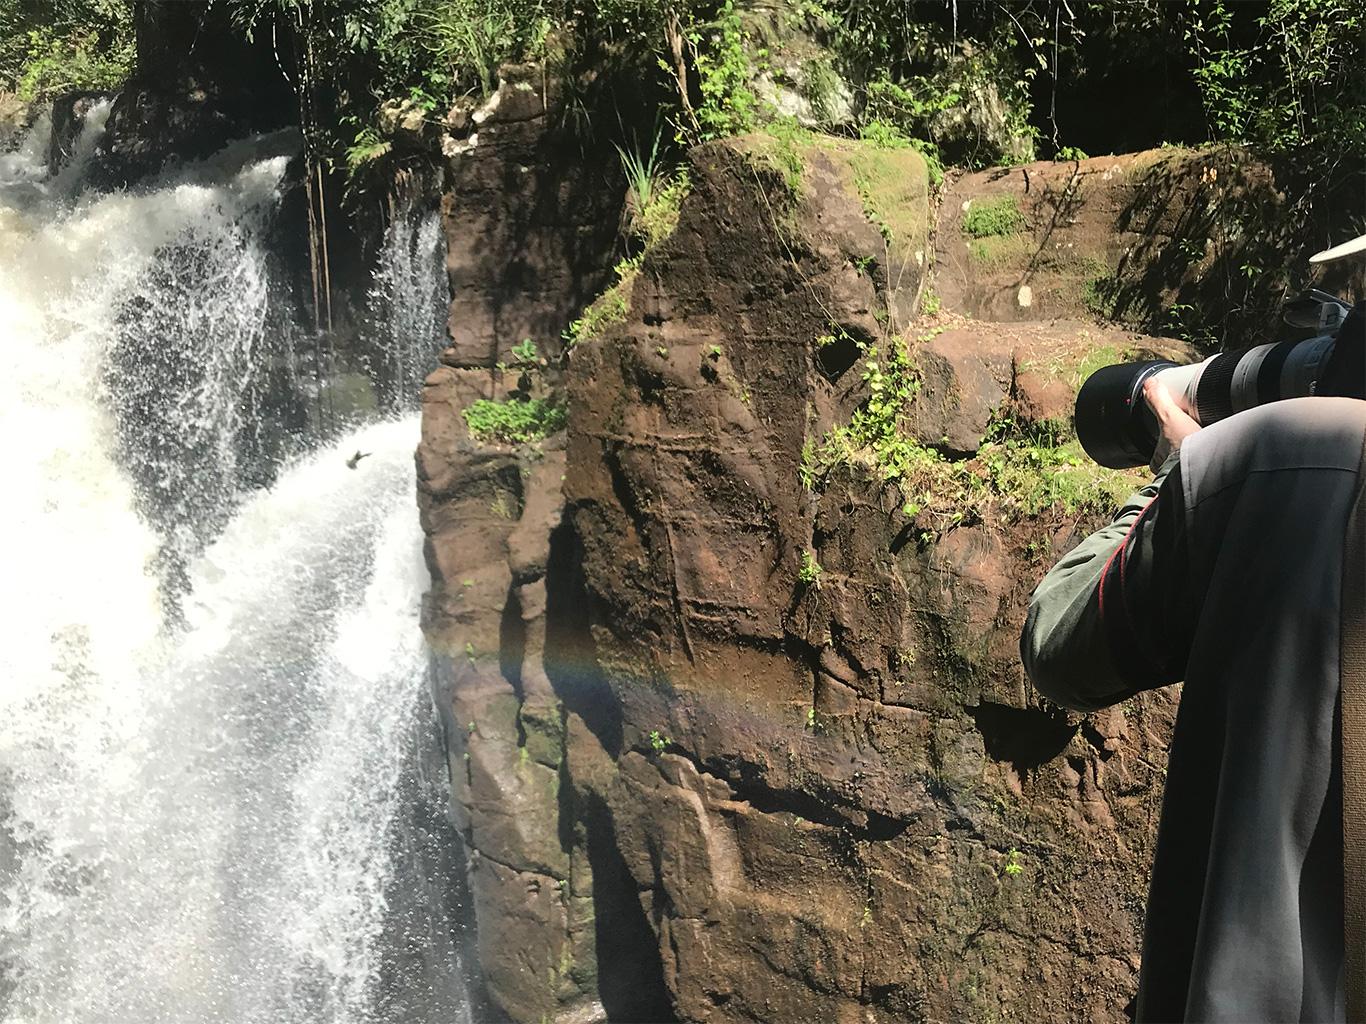 Photographing Great Dusky Swifts in Iguazú, Parque Nacional Iguazú, Argentina.